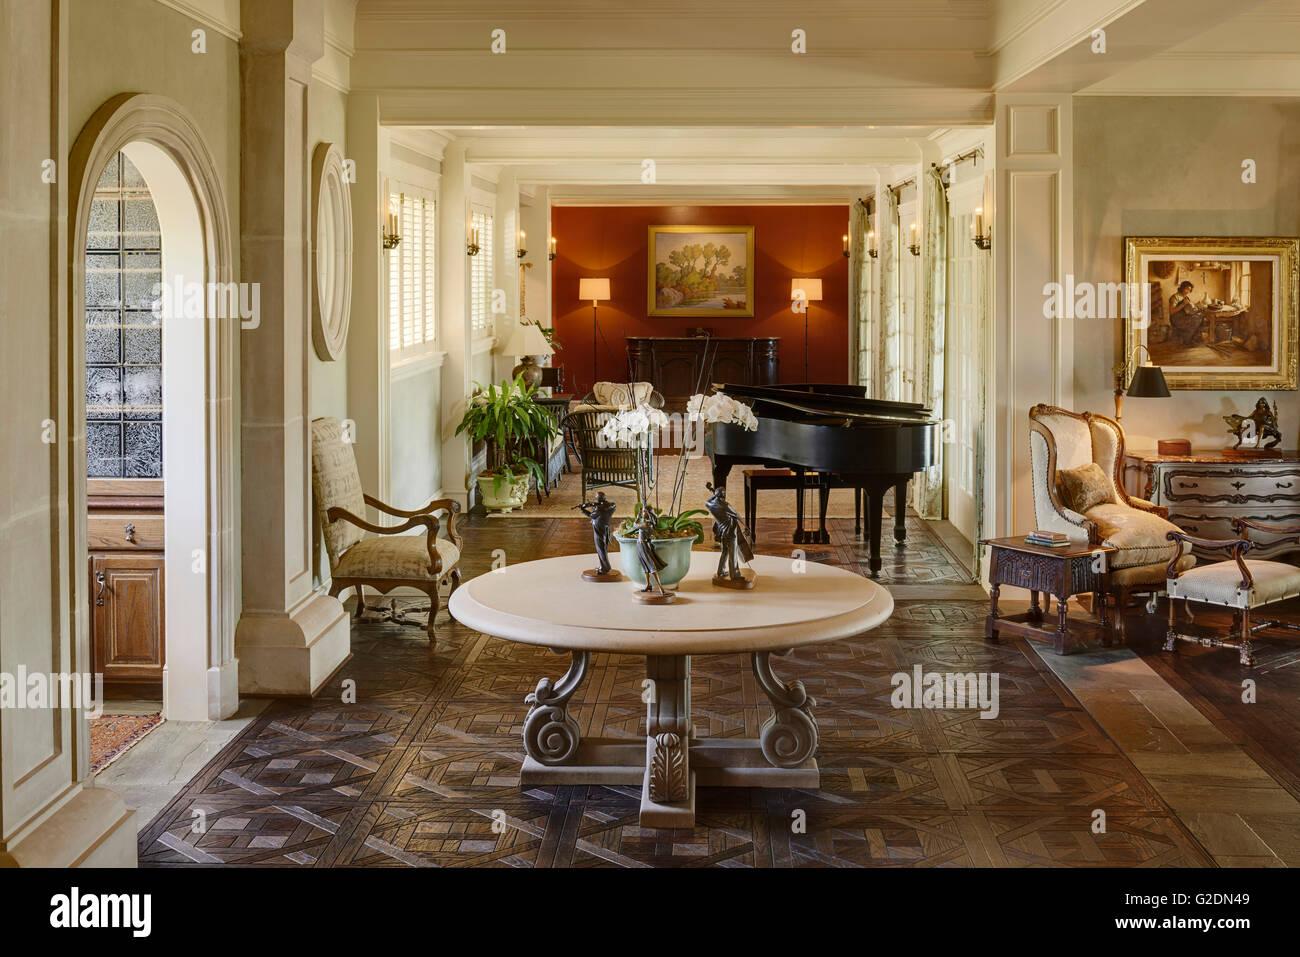 Foyer and Hallway of Affluent House - Stock Image